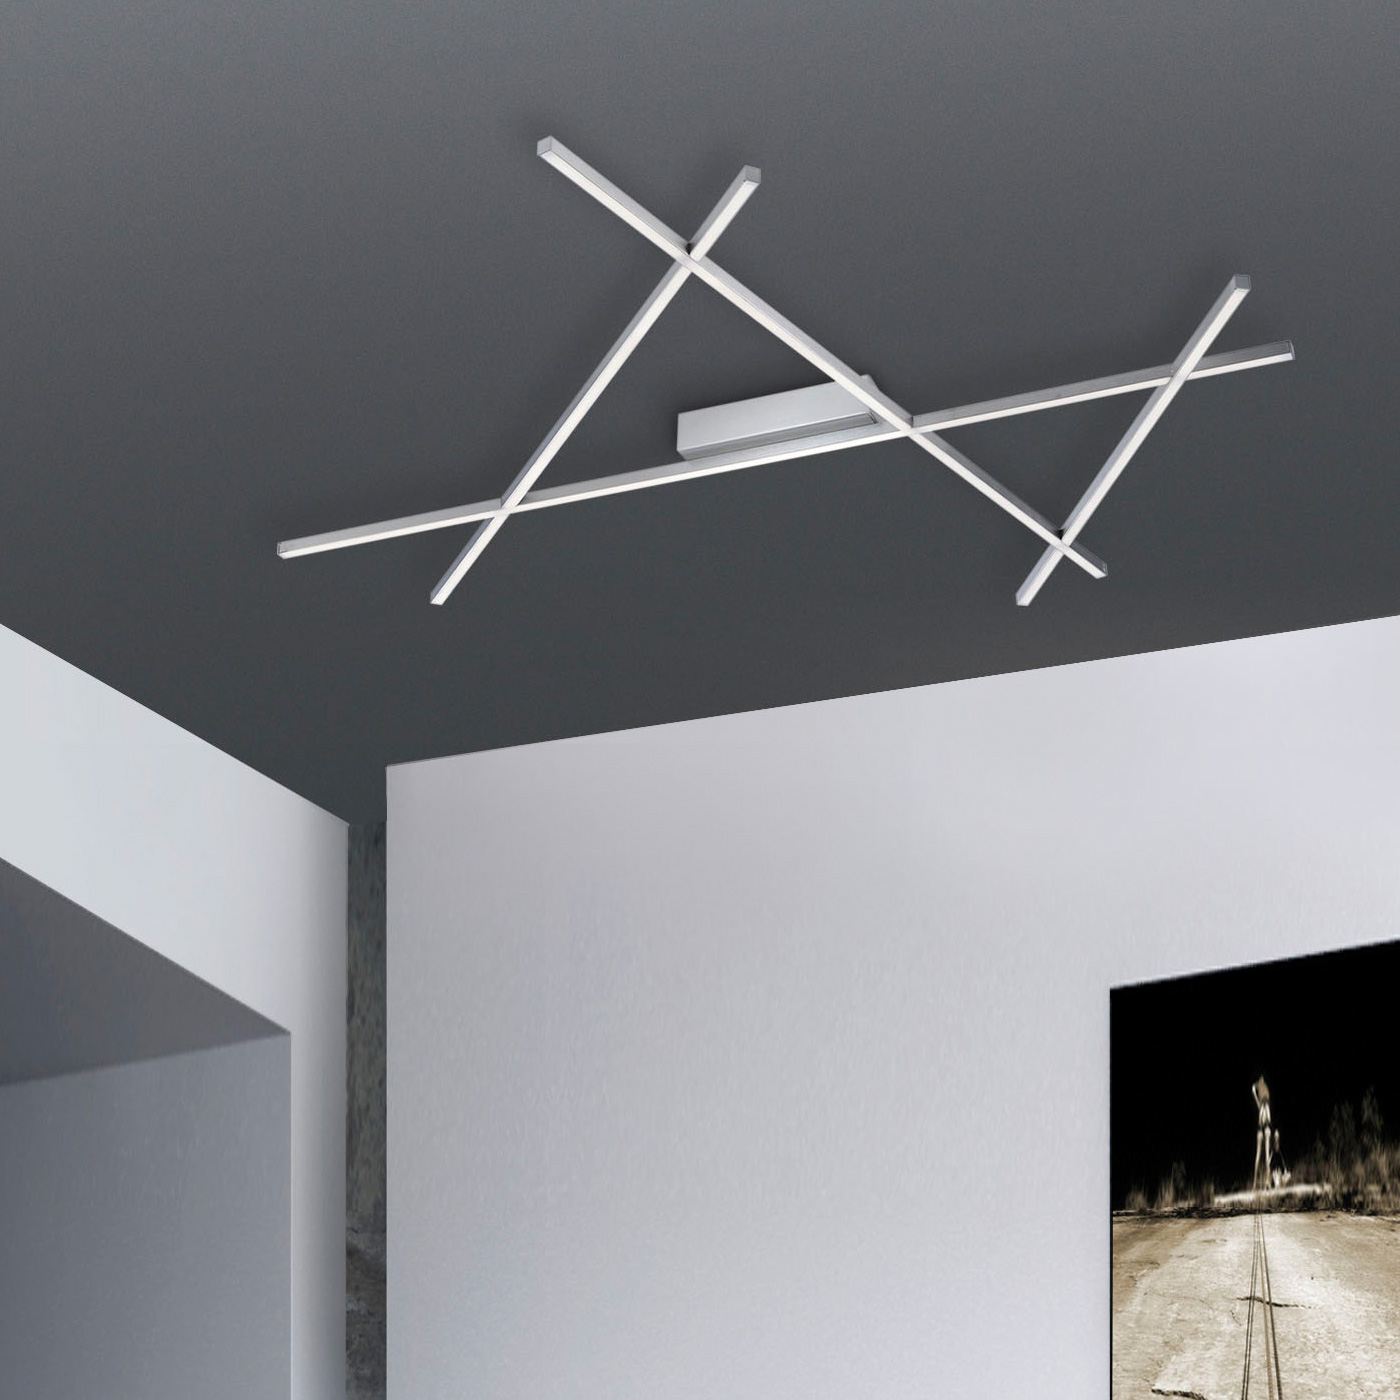 paul neuhaus stick 2 led deckenleuchte mit dimmer 8052 55 stick reuter onlineshop. Black Bedroom Furniture Sets. Home Design Ideas